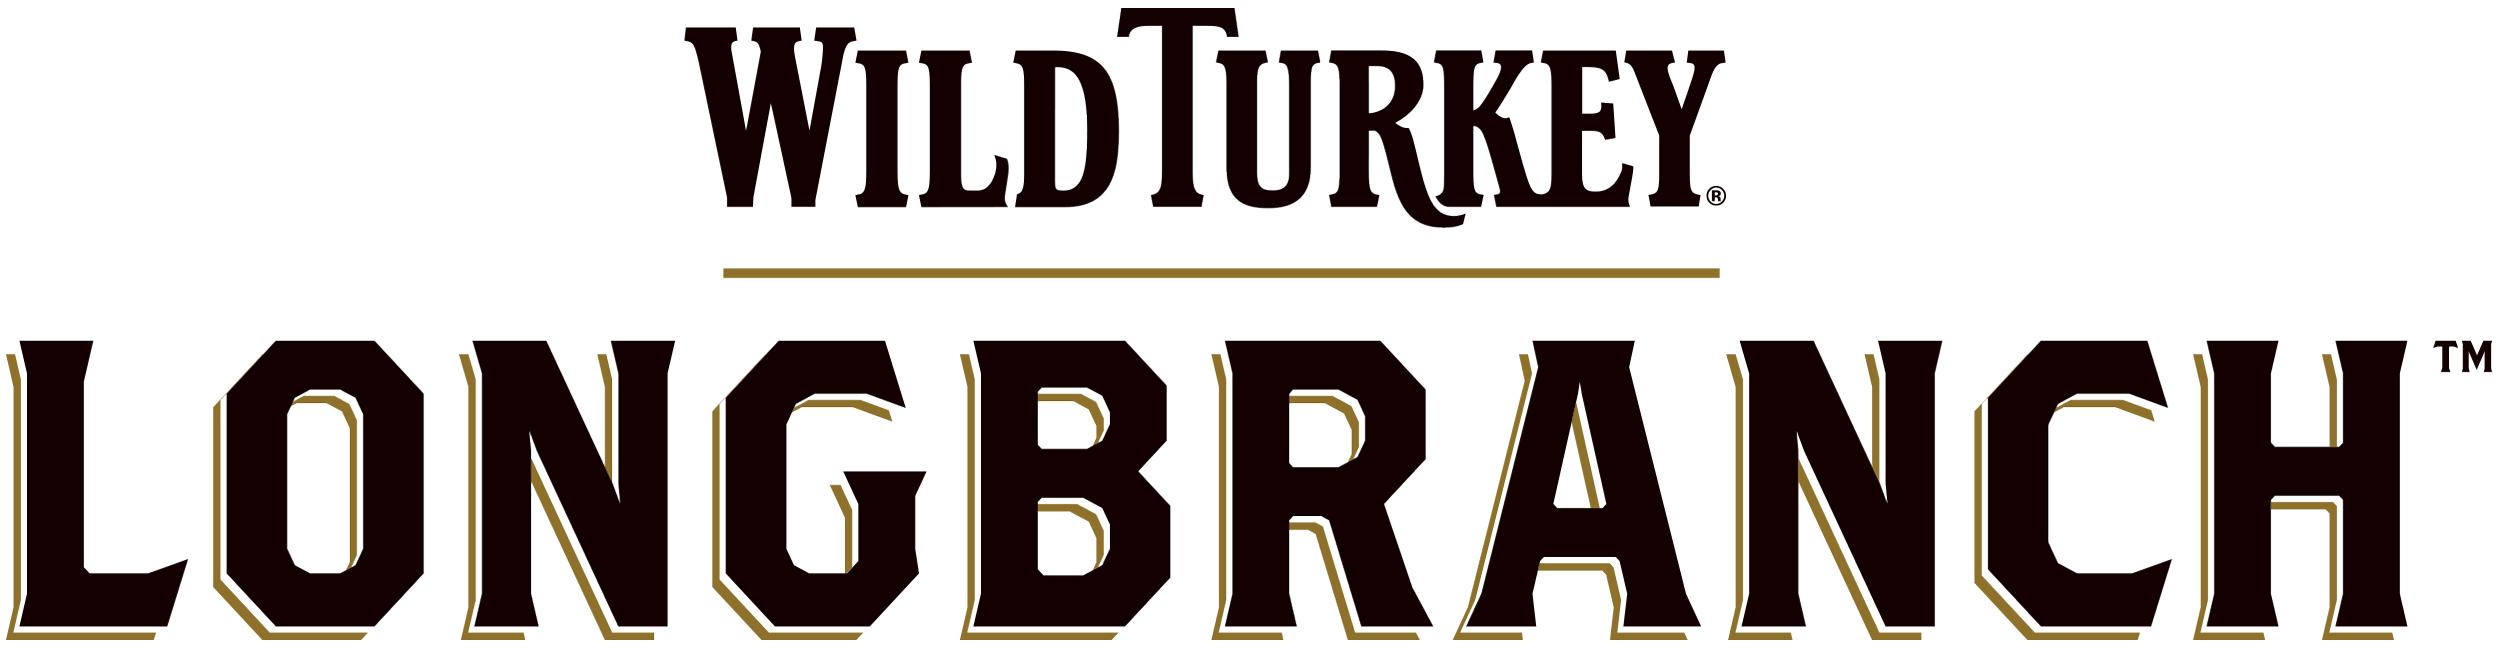 Wild-Turkey-Longbranch.JPG